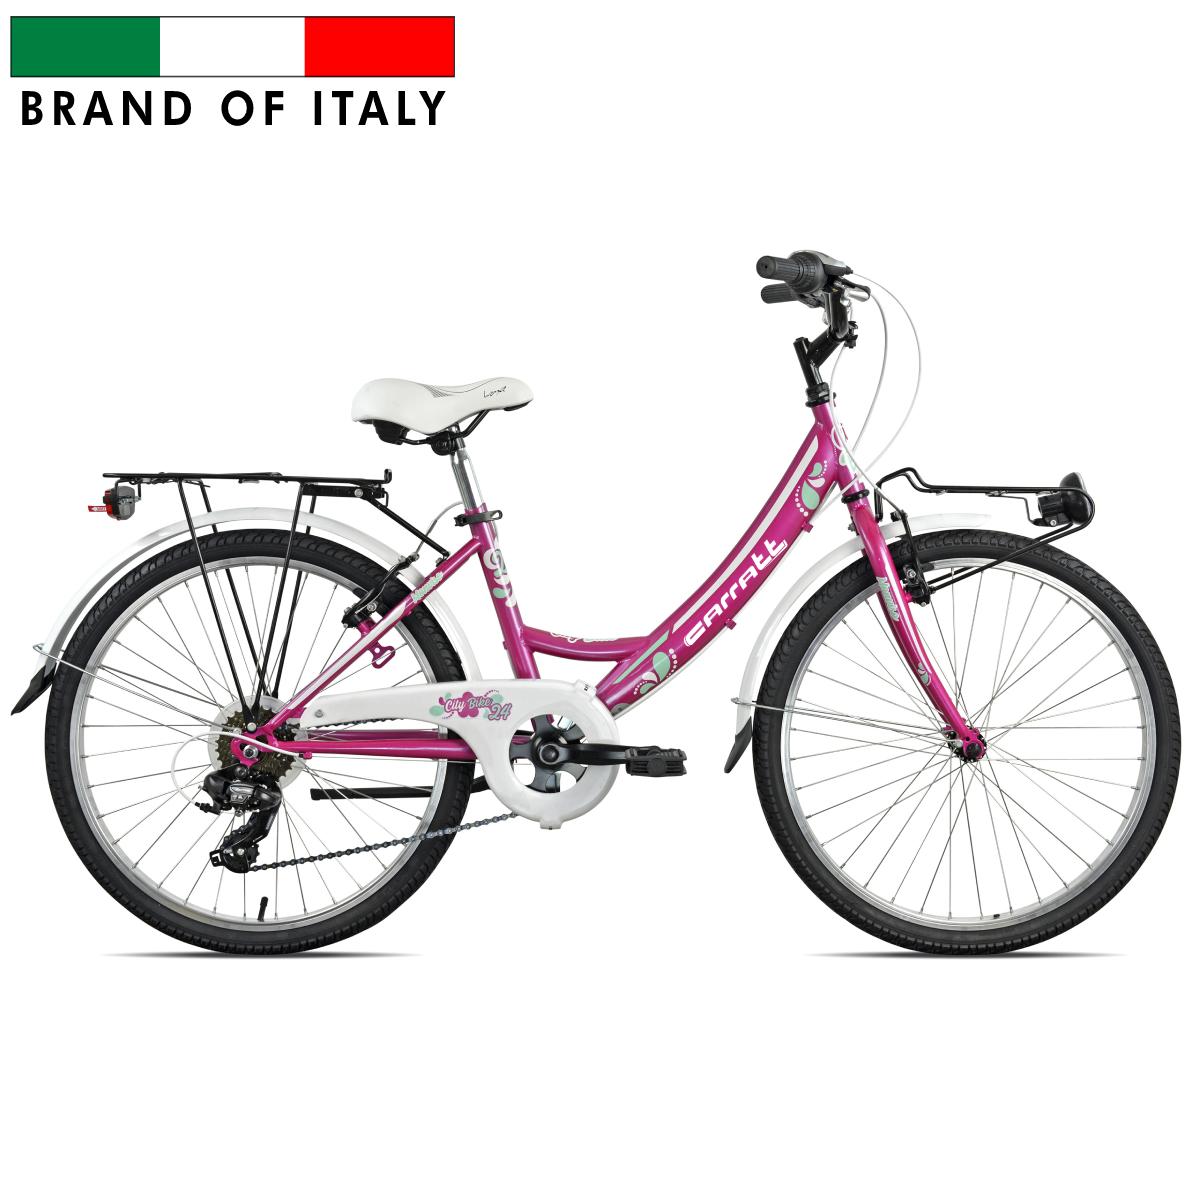 CARRATT 4400 CTB24 TY300 6V DONNA FUXIA 104400D Pilsētas velosipēds